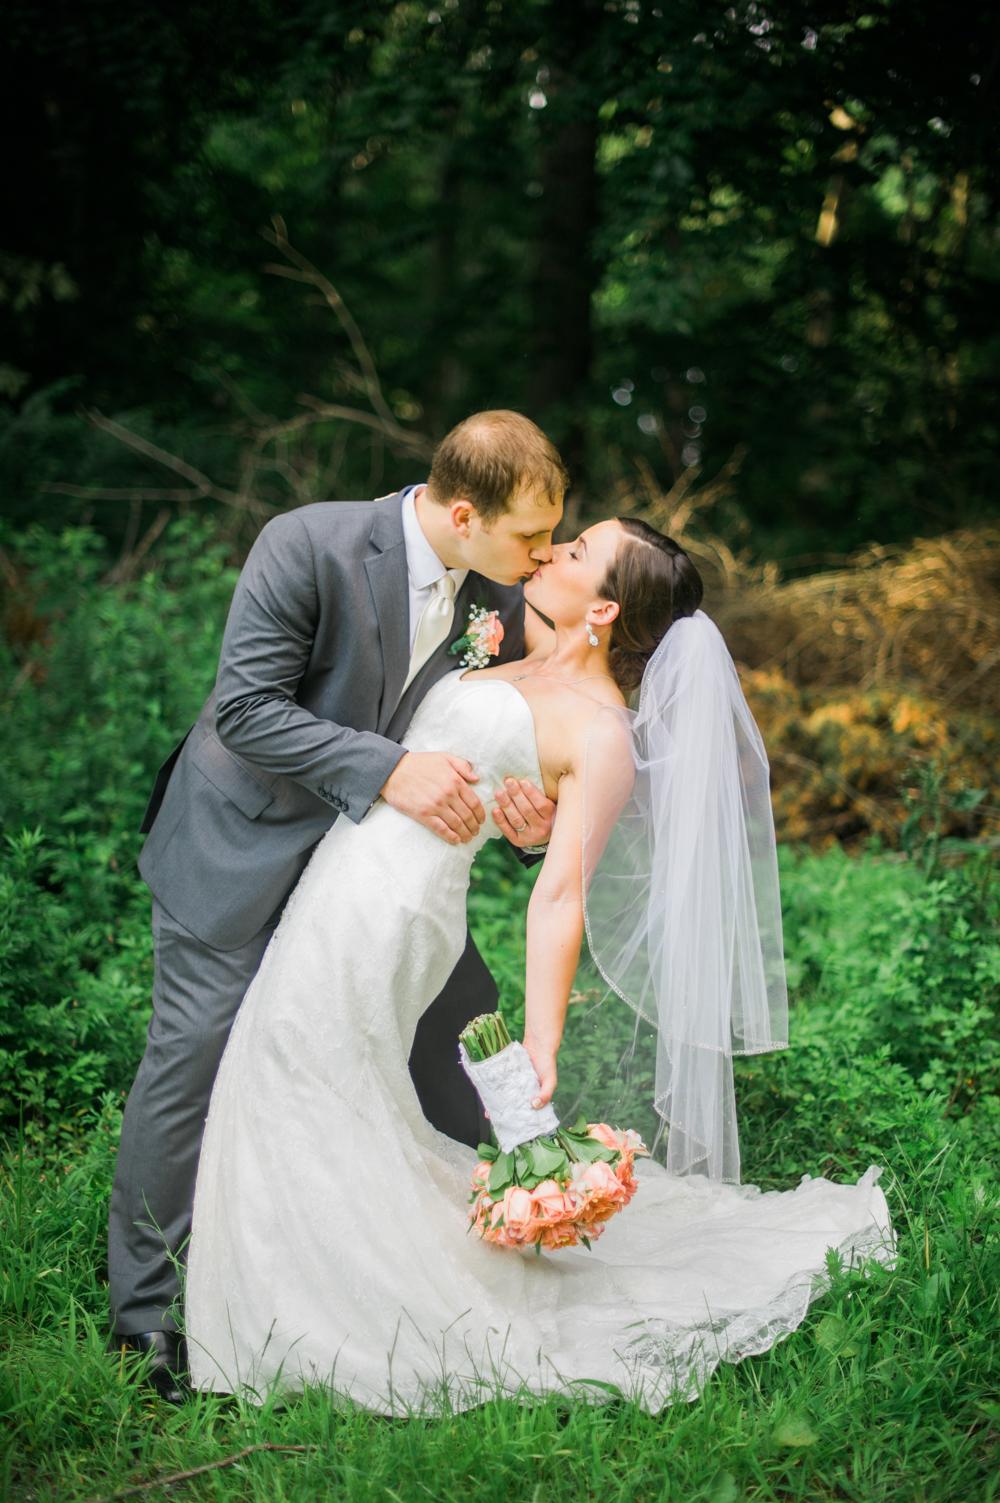 Mendenhall_Inn_Wedding_Pennsylvania_Rebecca_Watkins_Photography_2014-049.jpg